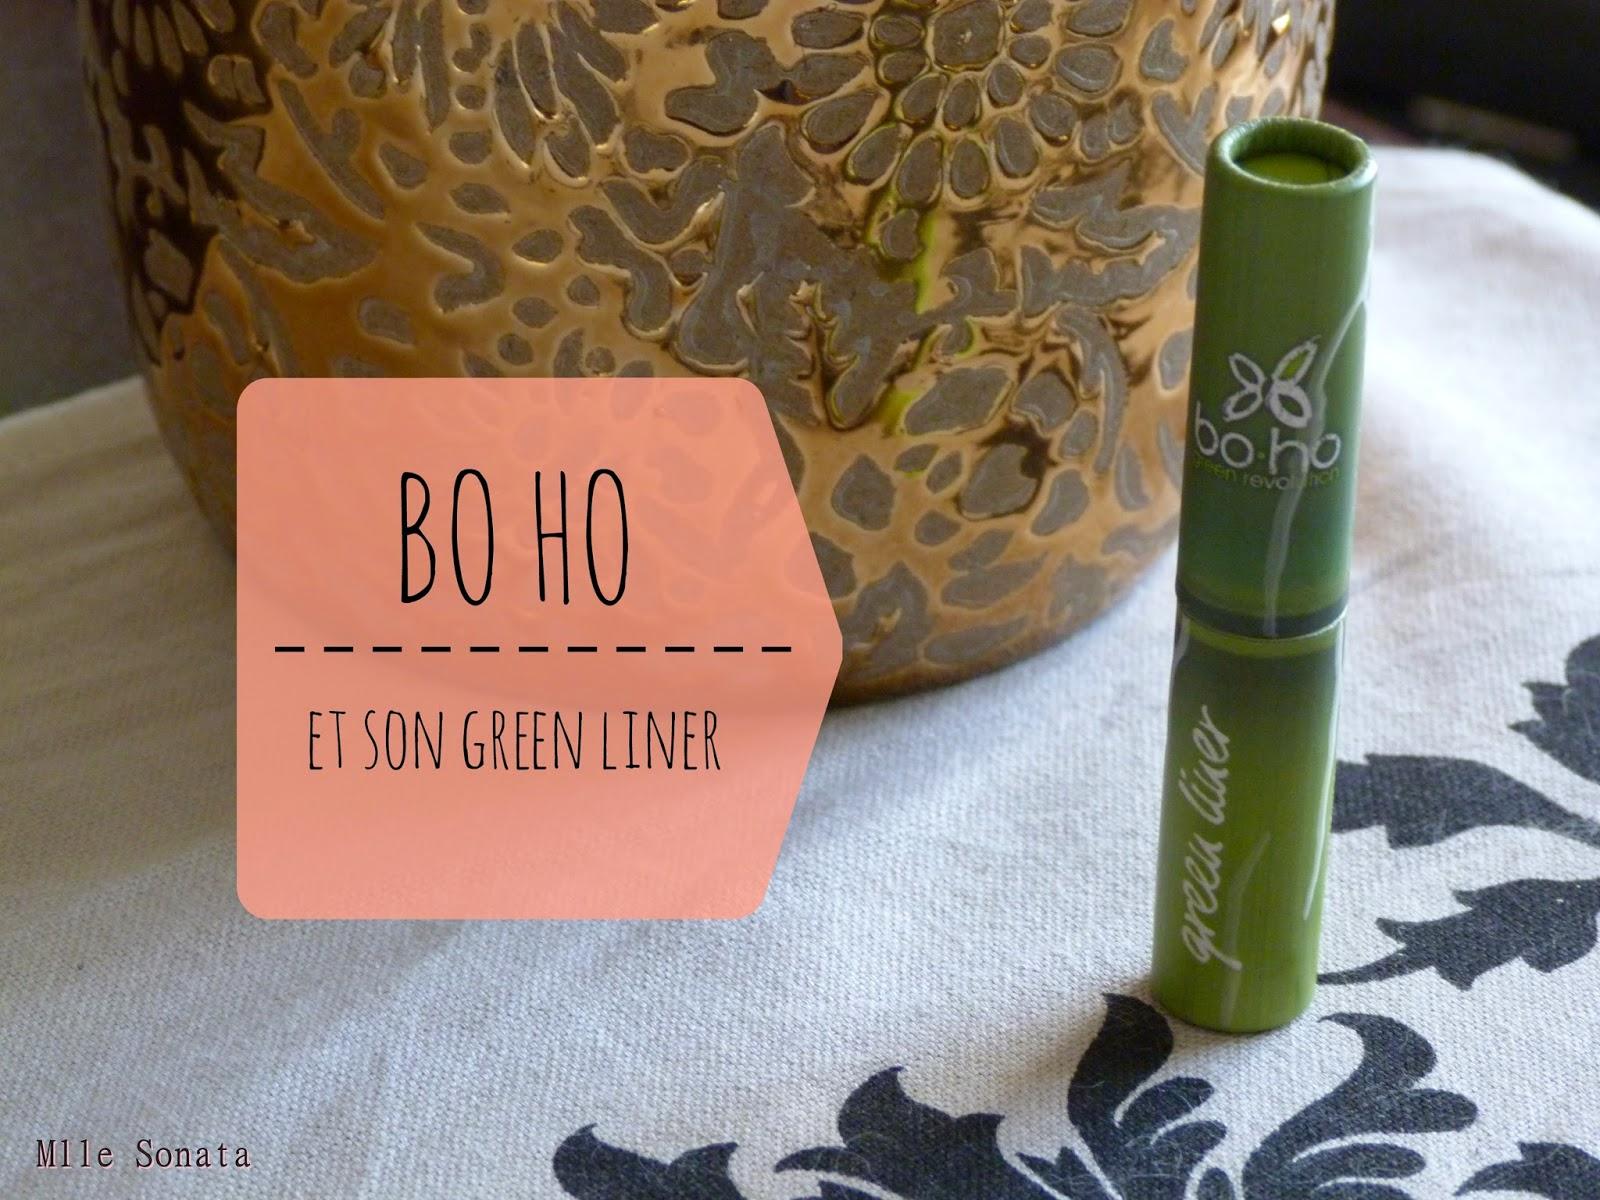 Test Liner Boho Cosmetics